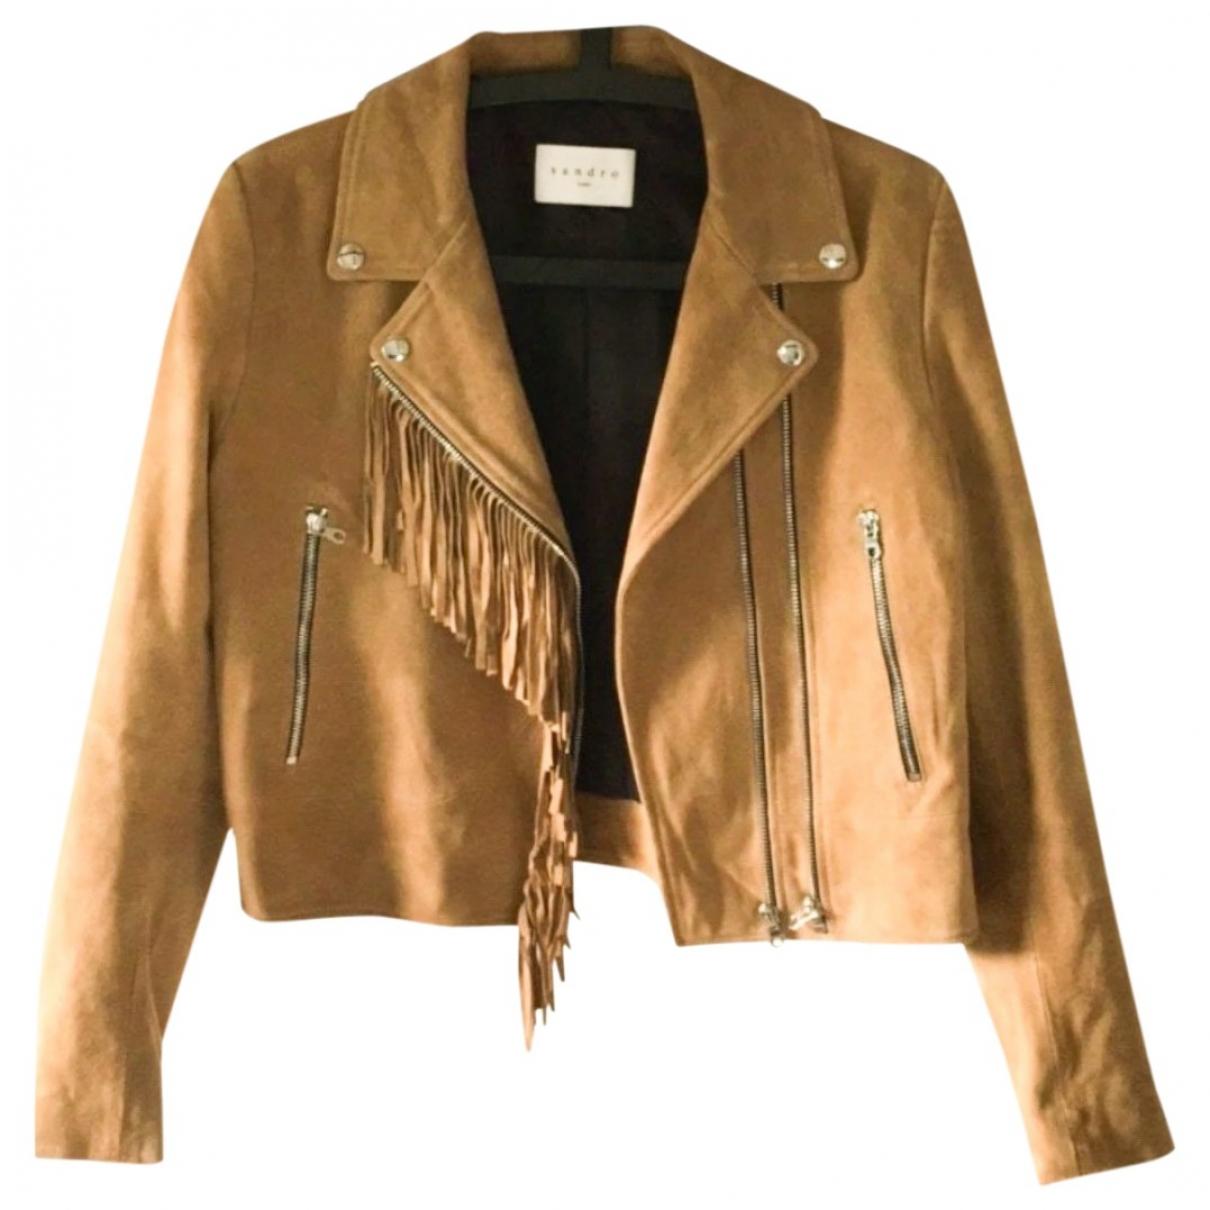 Sandro Spring Summer 2020 Camel Leather jacket for Women 38 FR